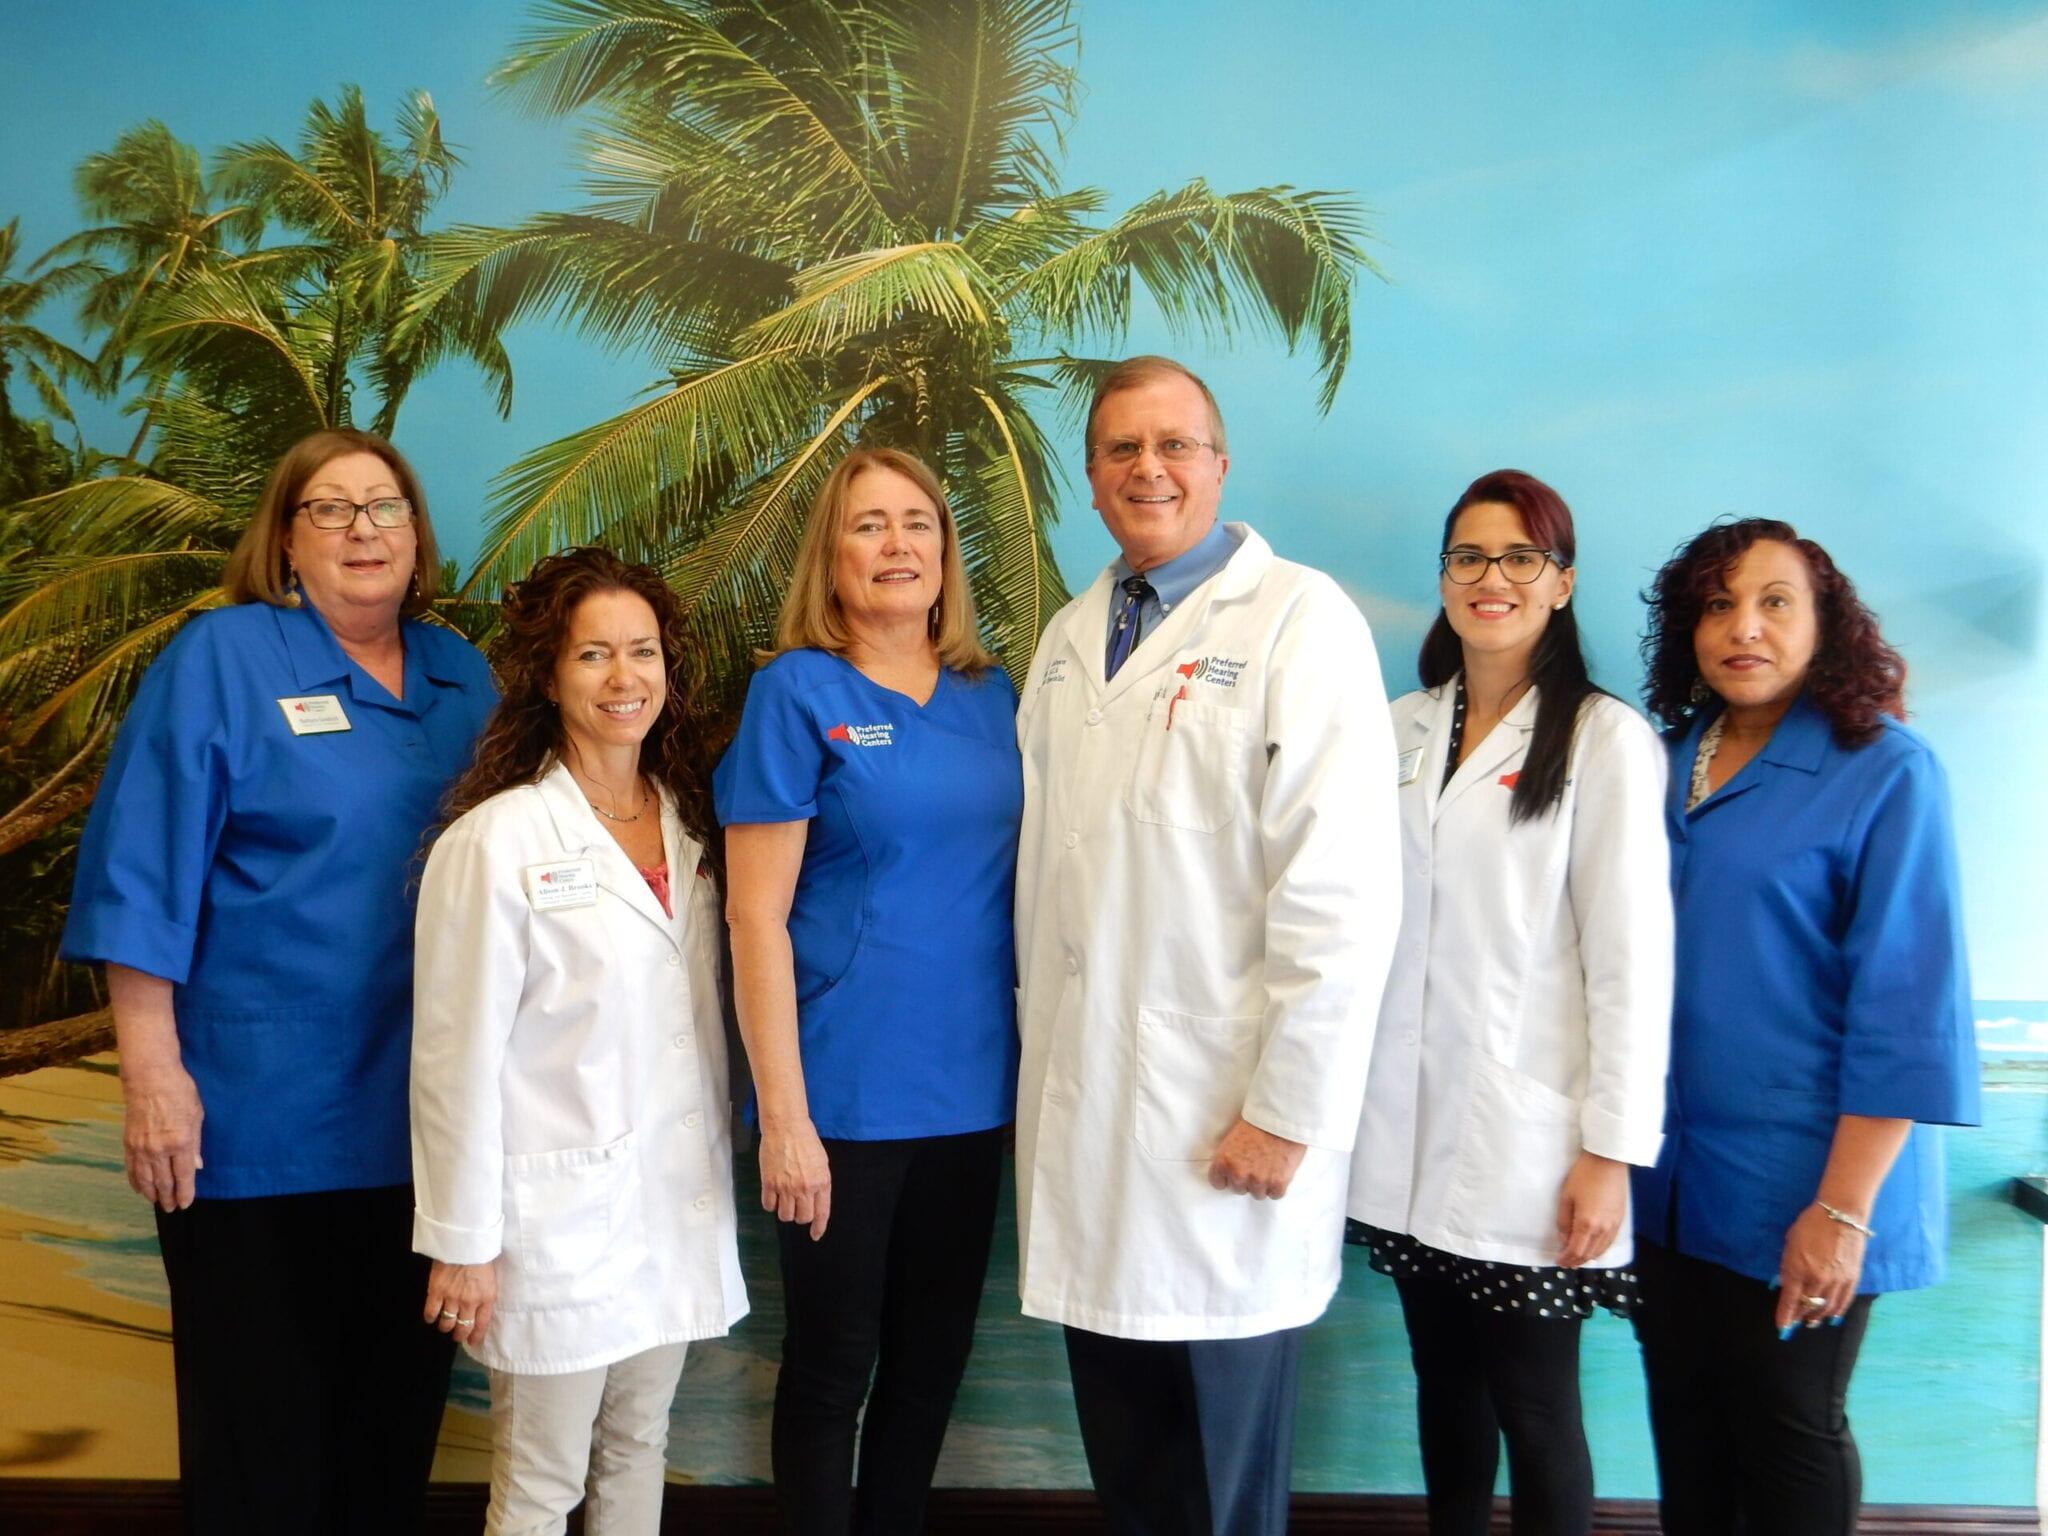 Preferred hearing centers team picture